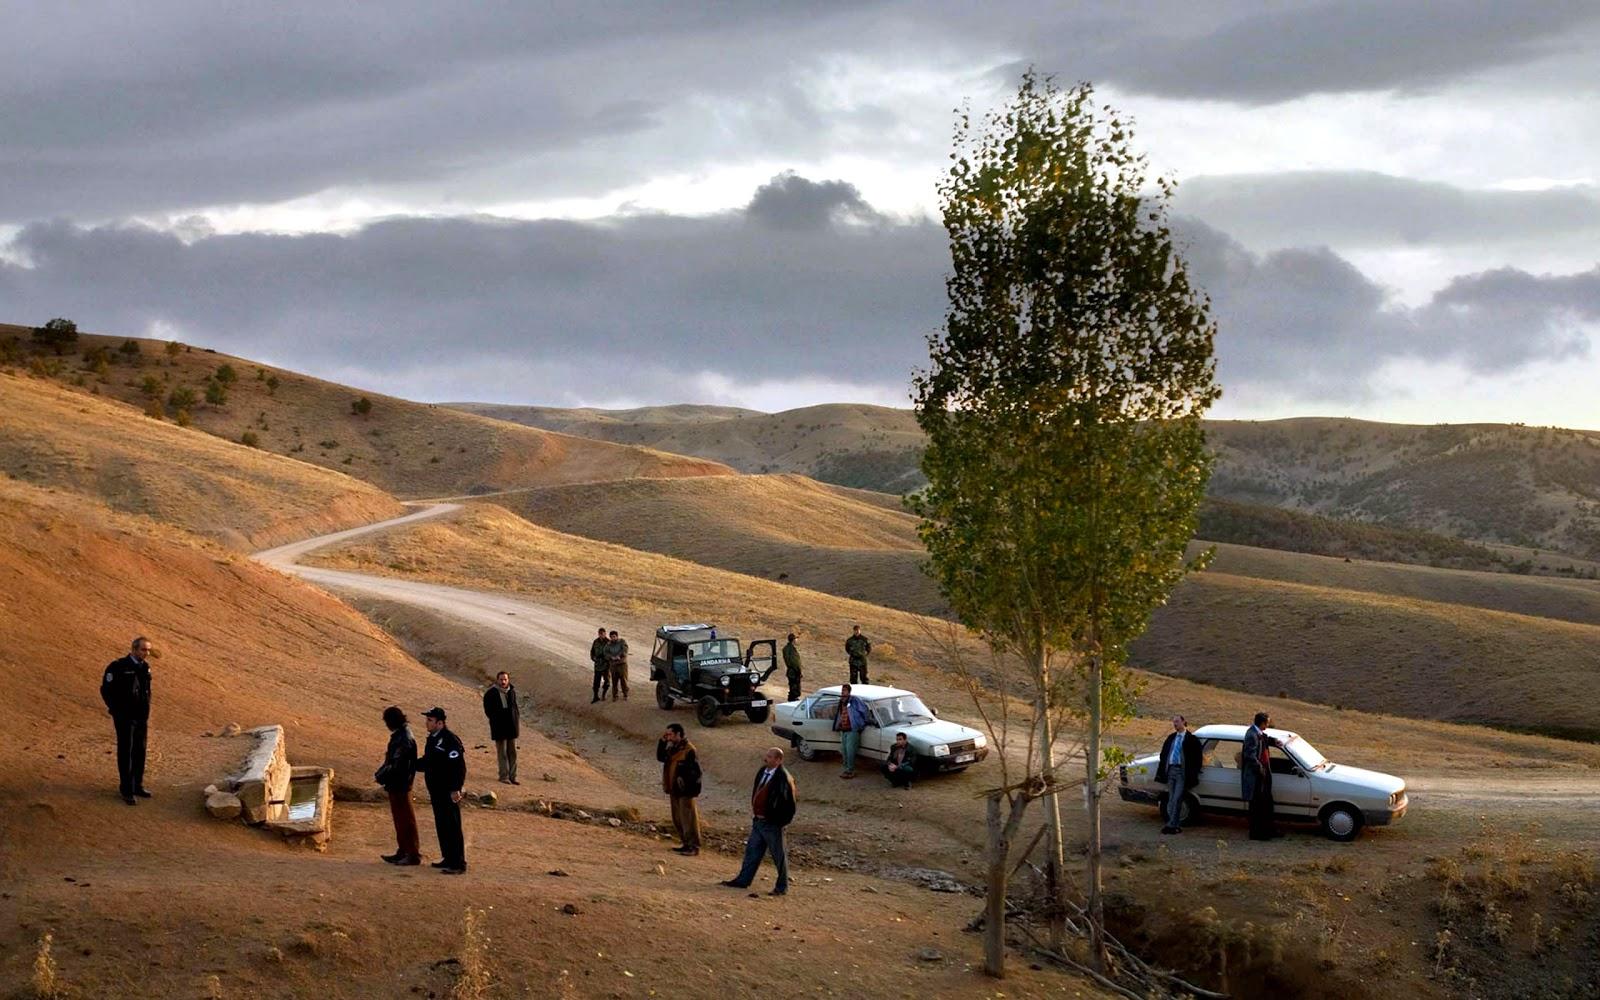 Bir zamanlar Anadolu'da (Once Upon a Time in Anatolia, 2011)